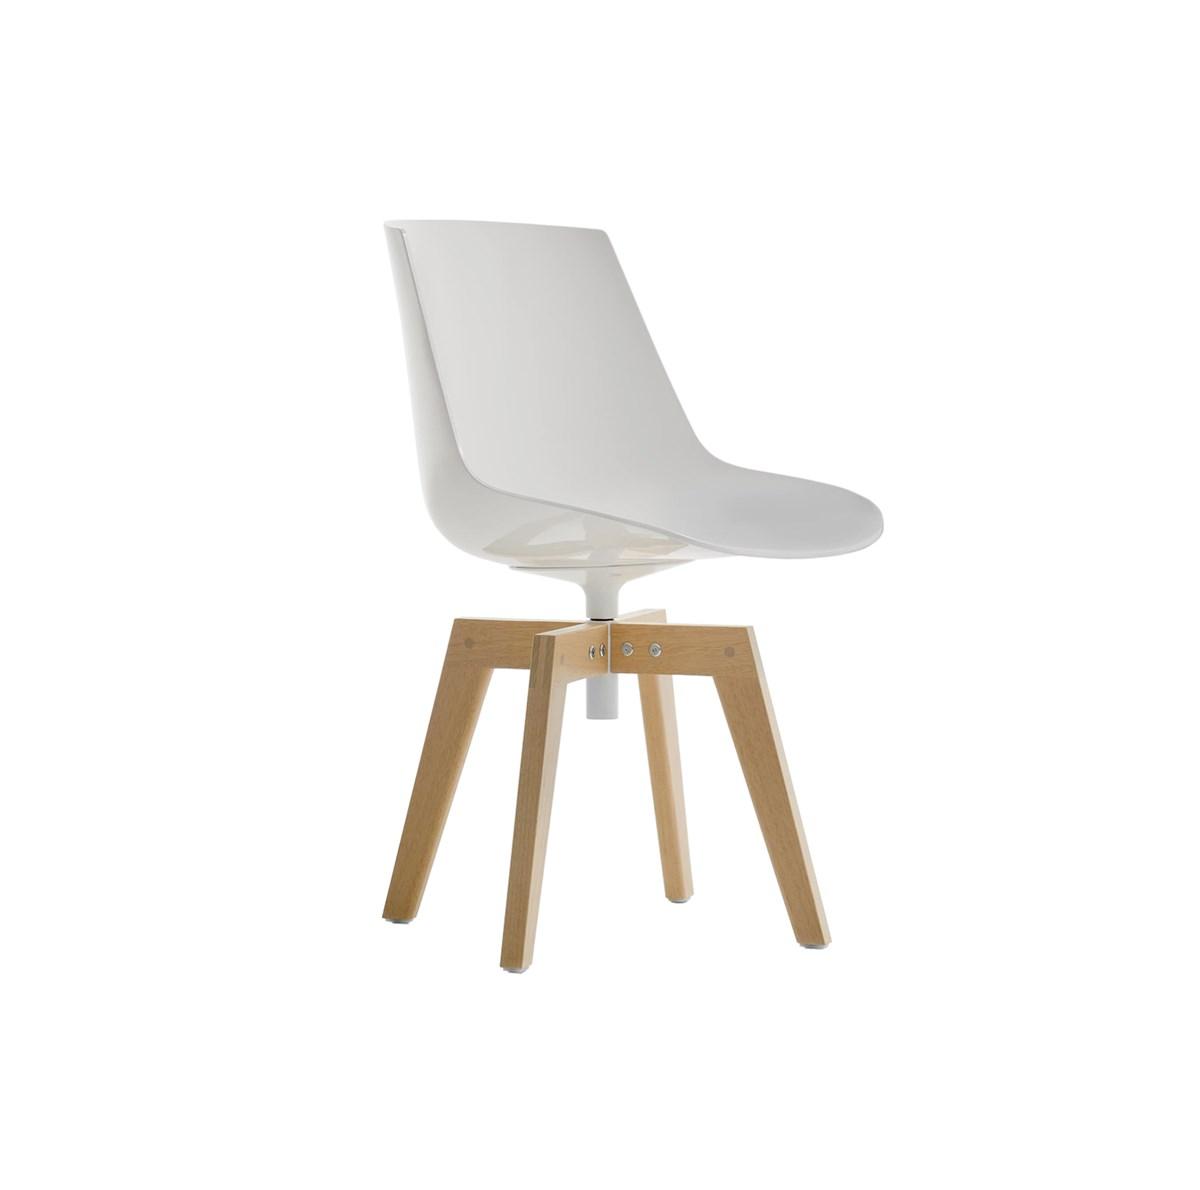 MDF-Italia-Jean-Marie-Massaud-Flow-Chair-Iroko-Matisse-1